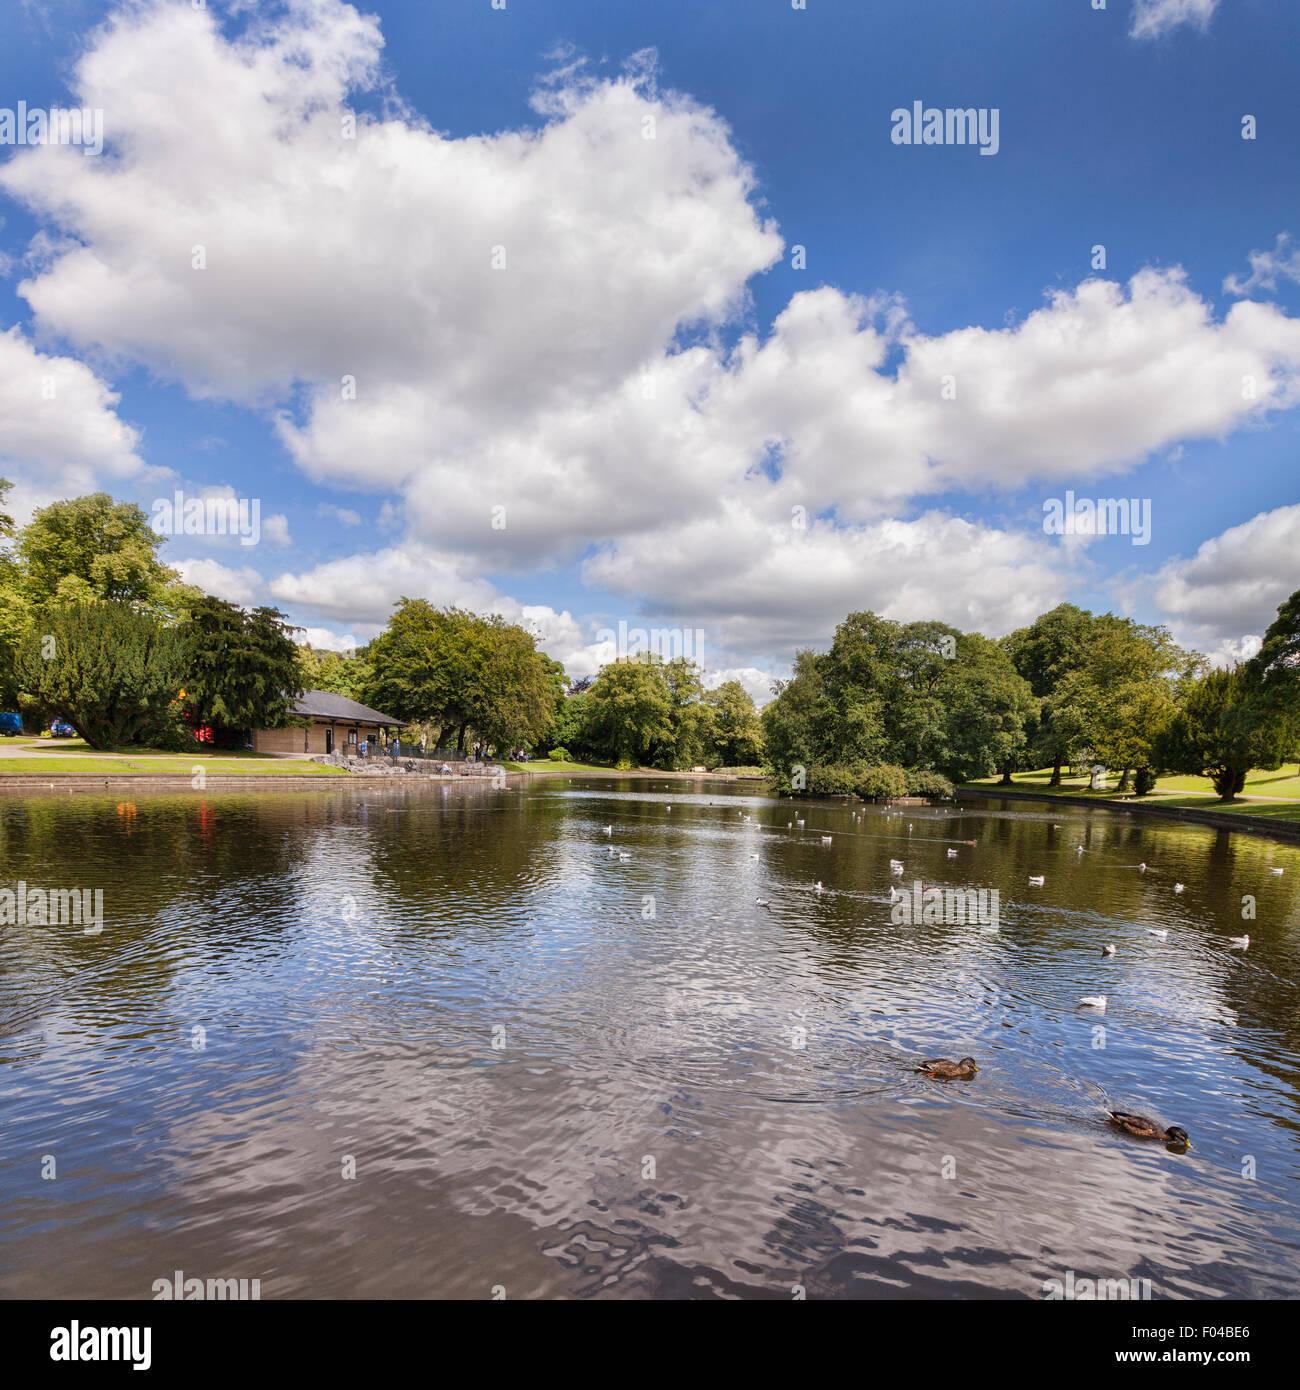 Buxton Pavilion Gardens, Buxton, Derbyshire, England - Stock Image